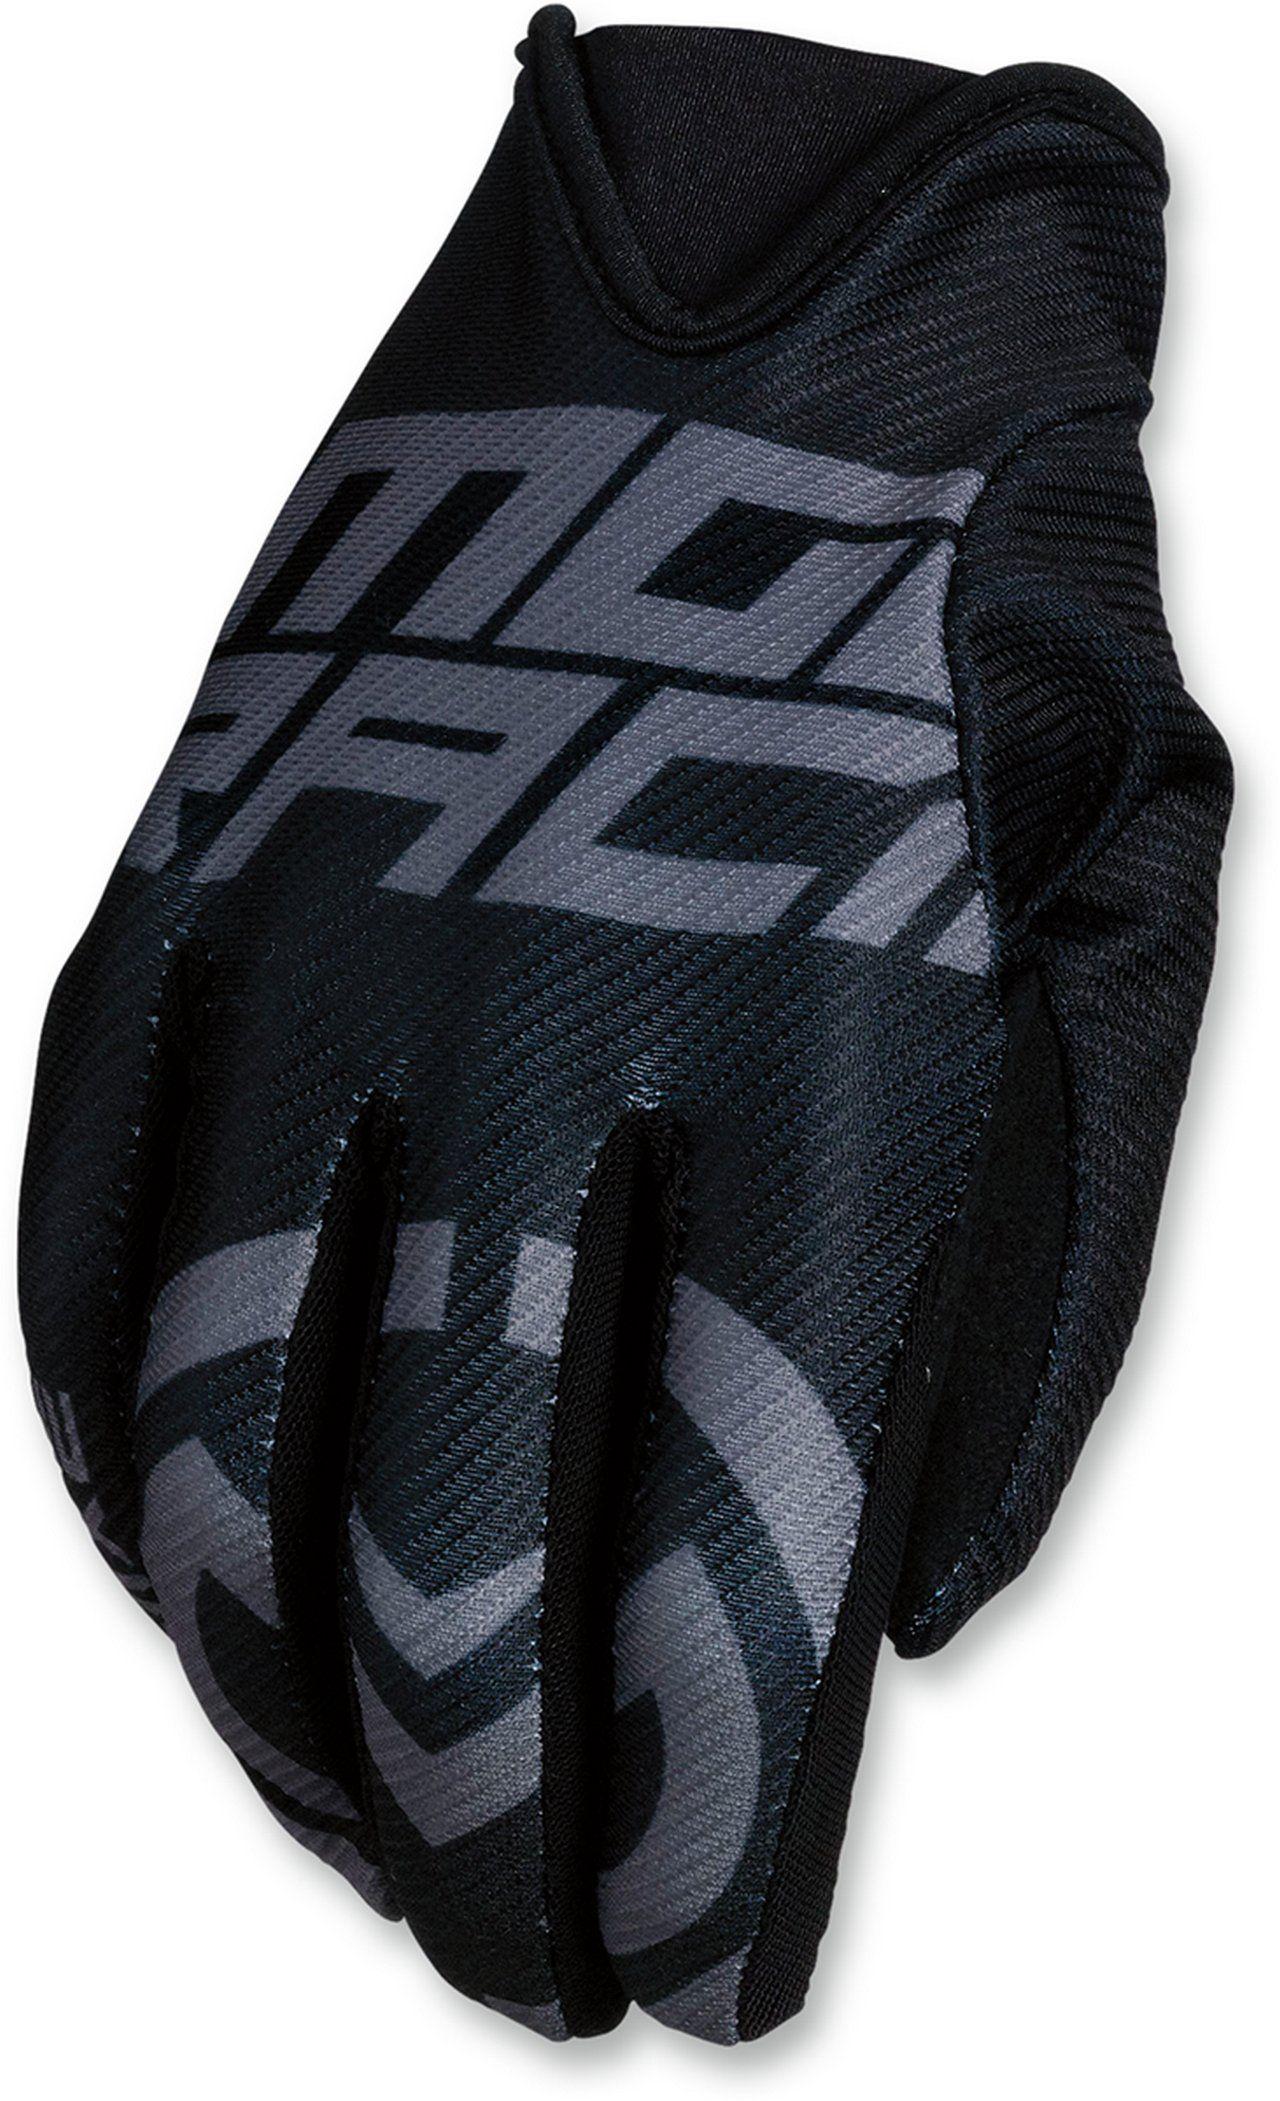 【MOOSE RACING】MX2 手套 [3330-4536] - 「Webike-摩托百貨」